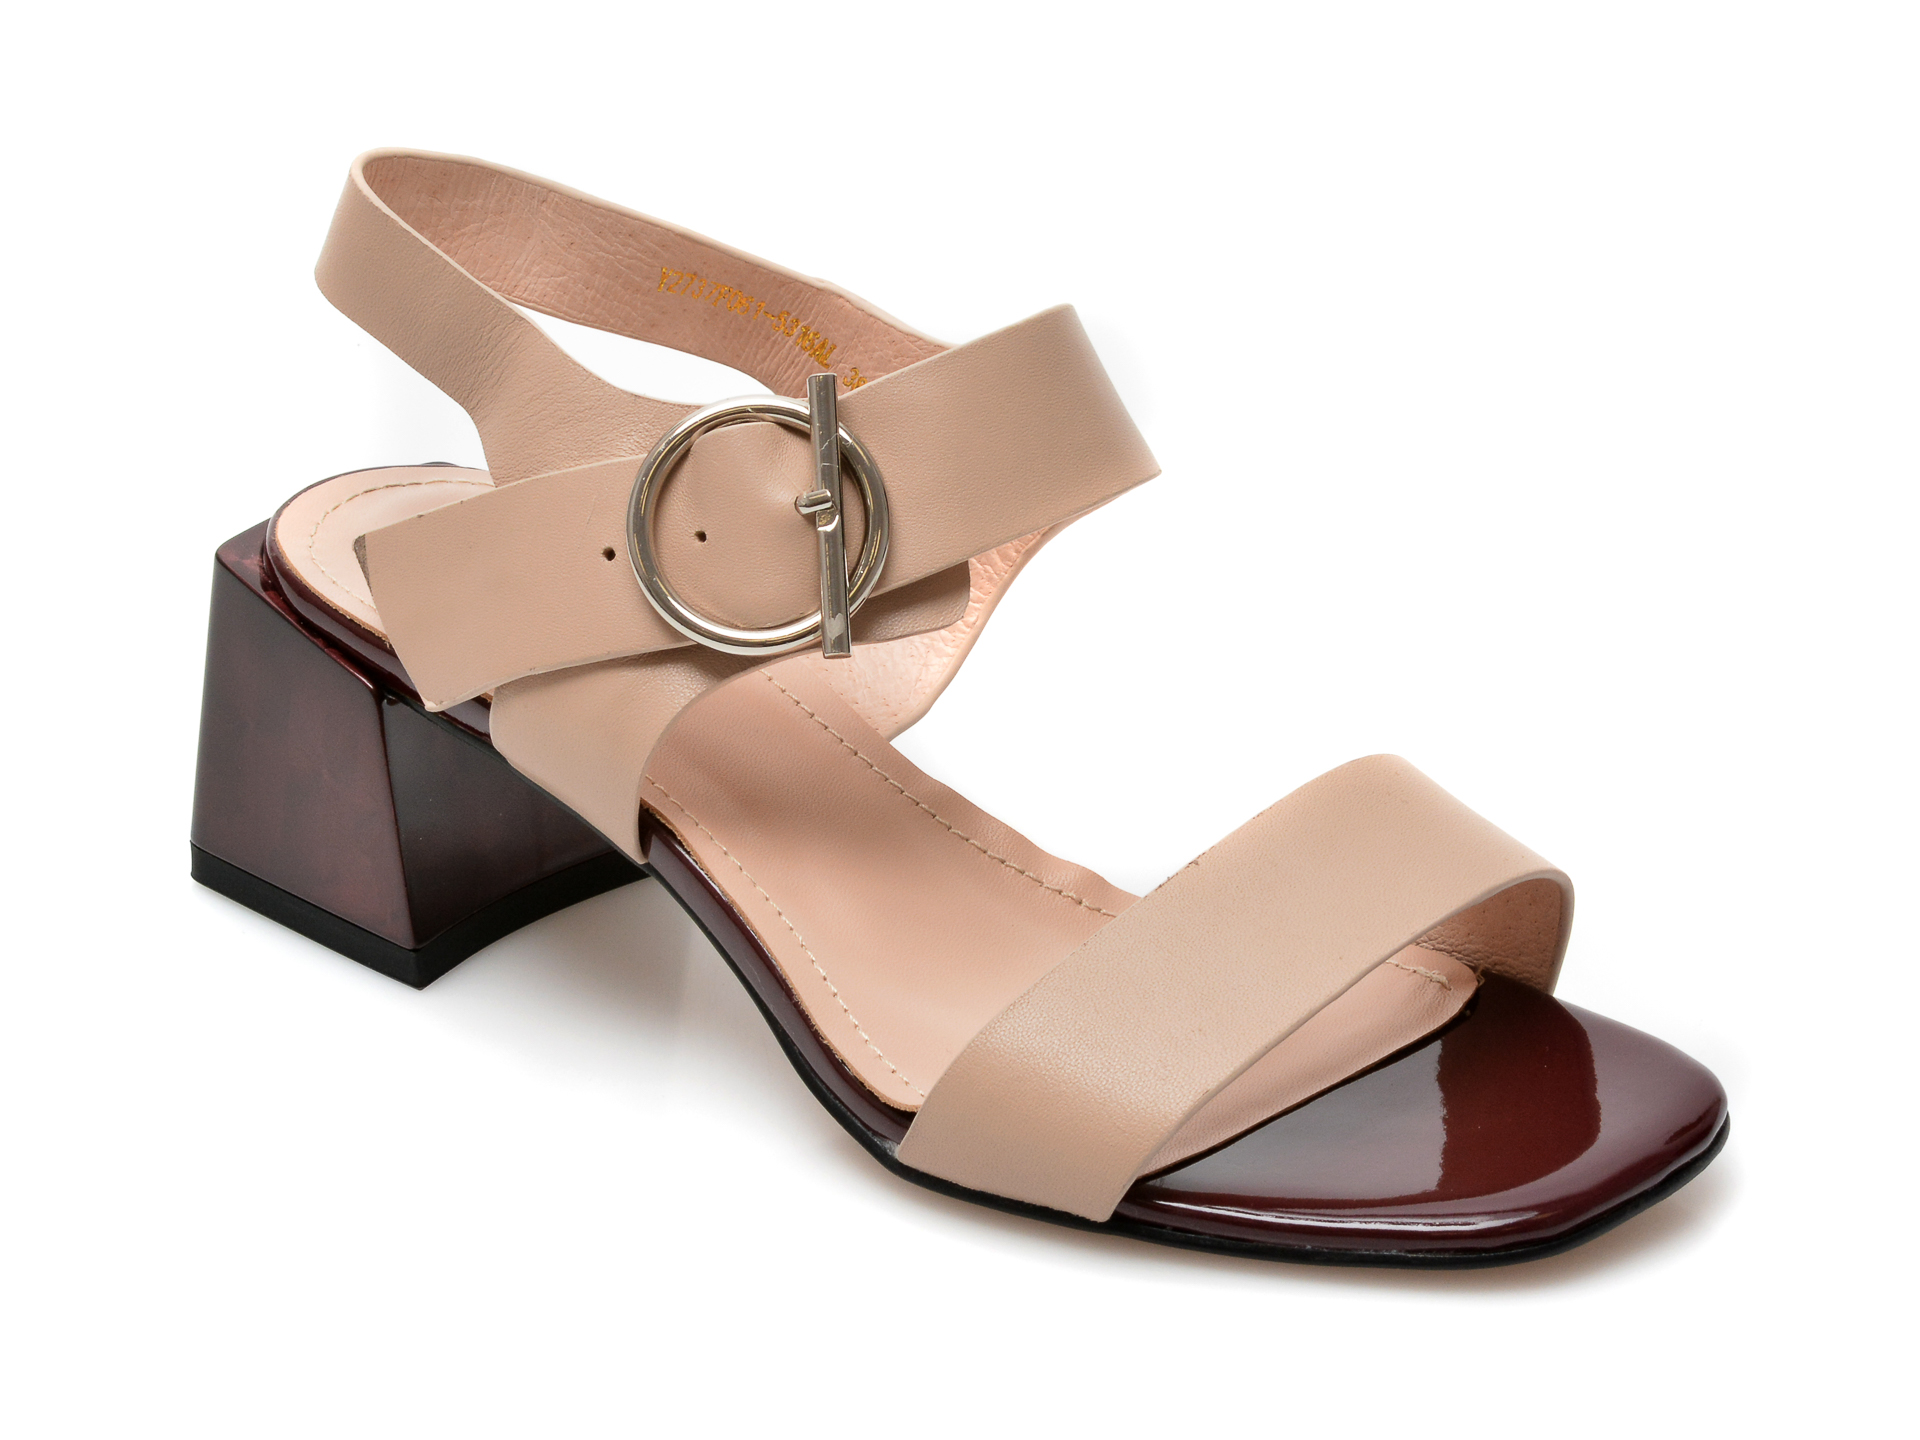 Sandale FLAVIA PASSINI nude, Y2737F0, din piele naturala